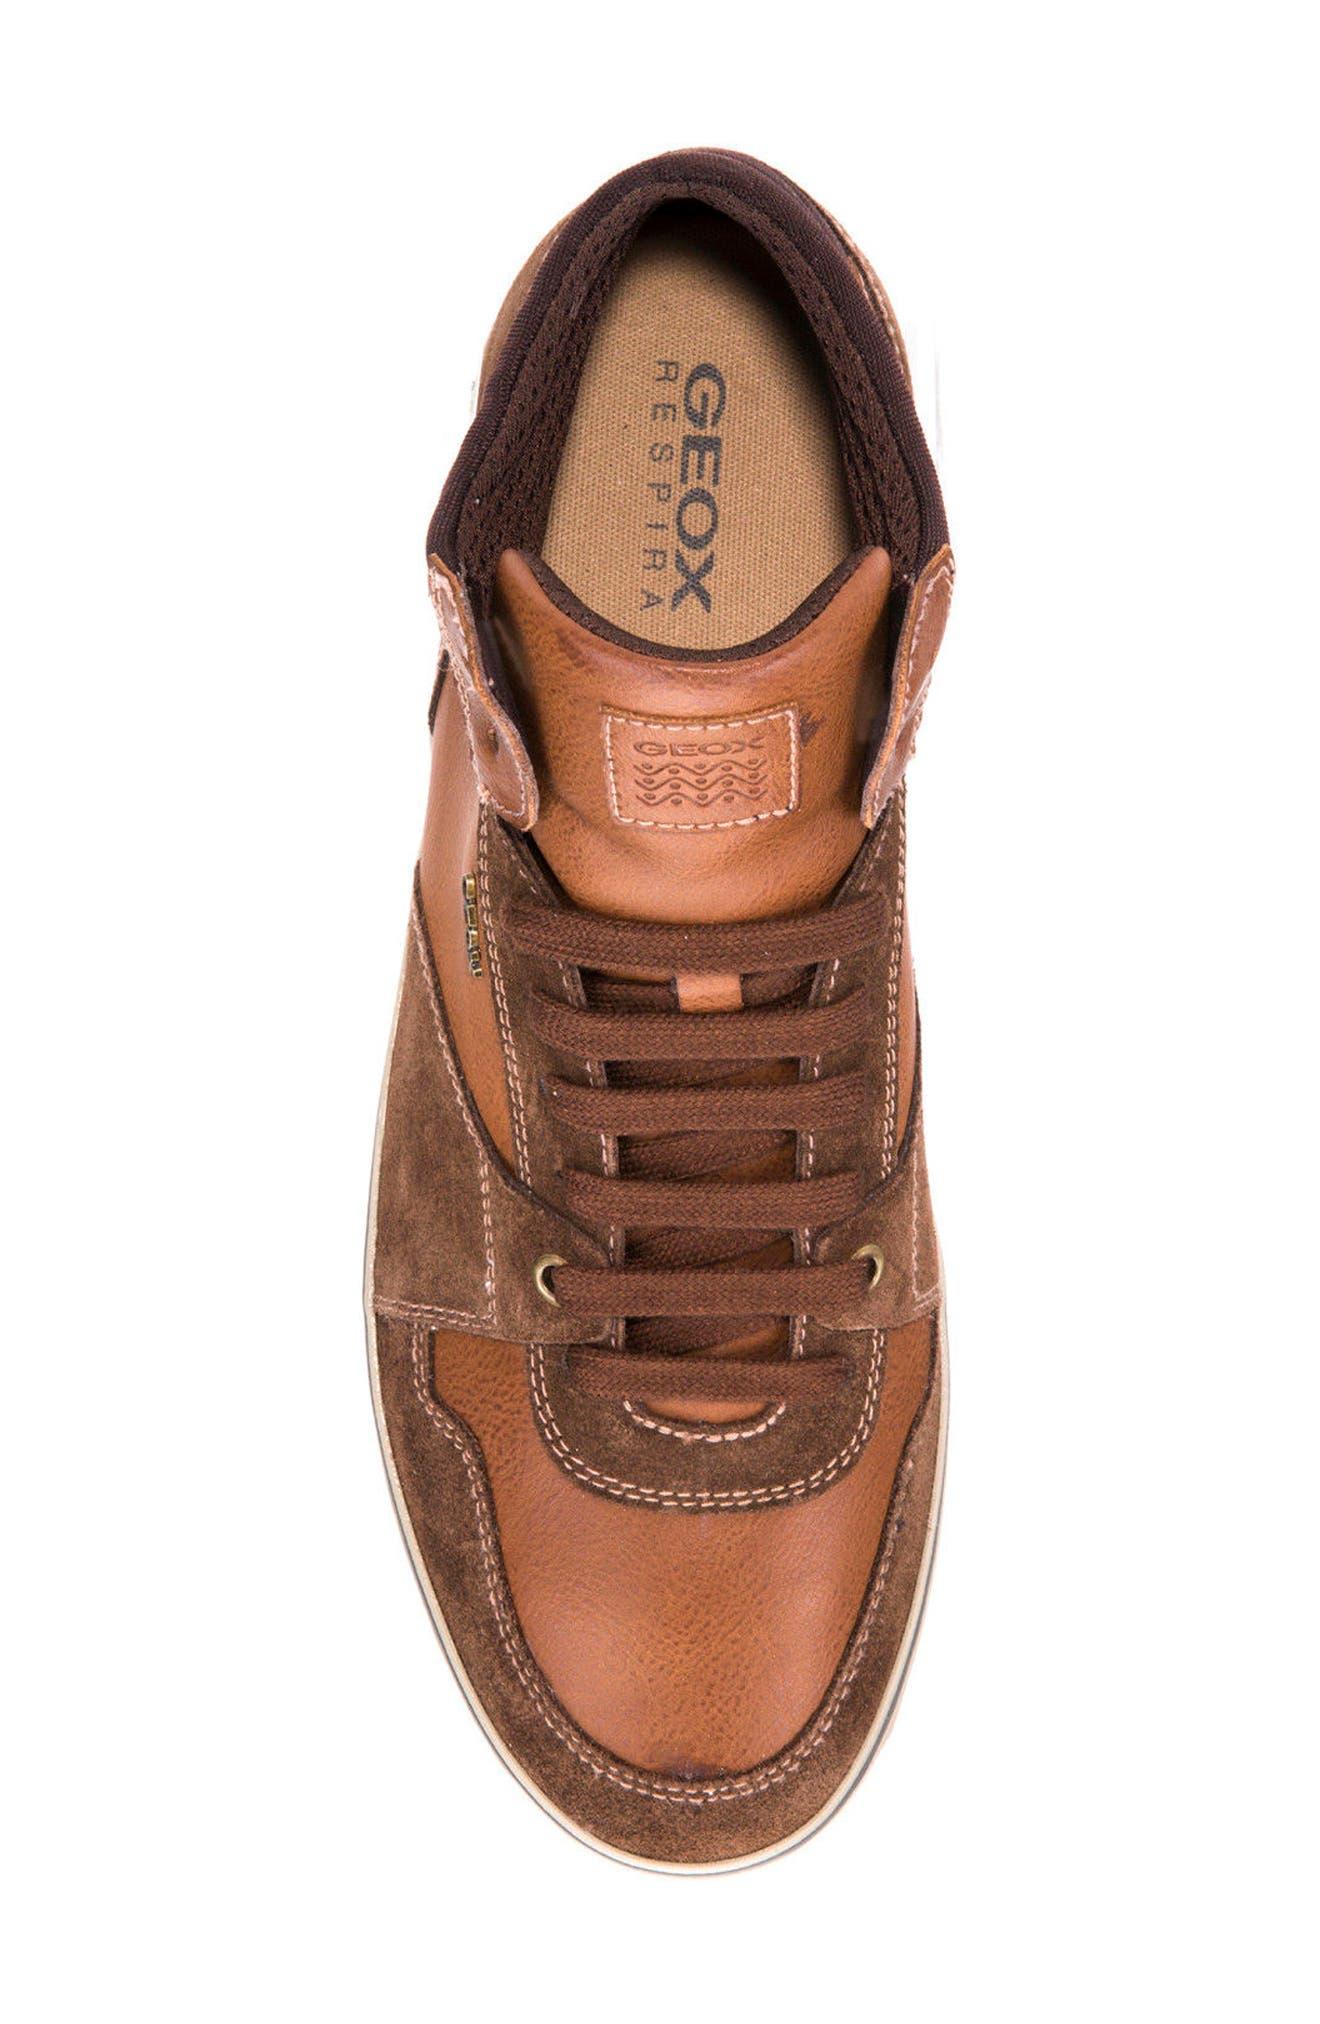 Box 30 High Top Sneaker,                             Alternate thumbnail 5, color,